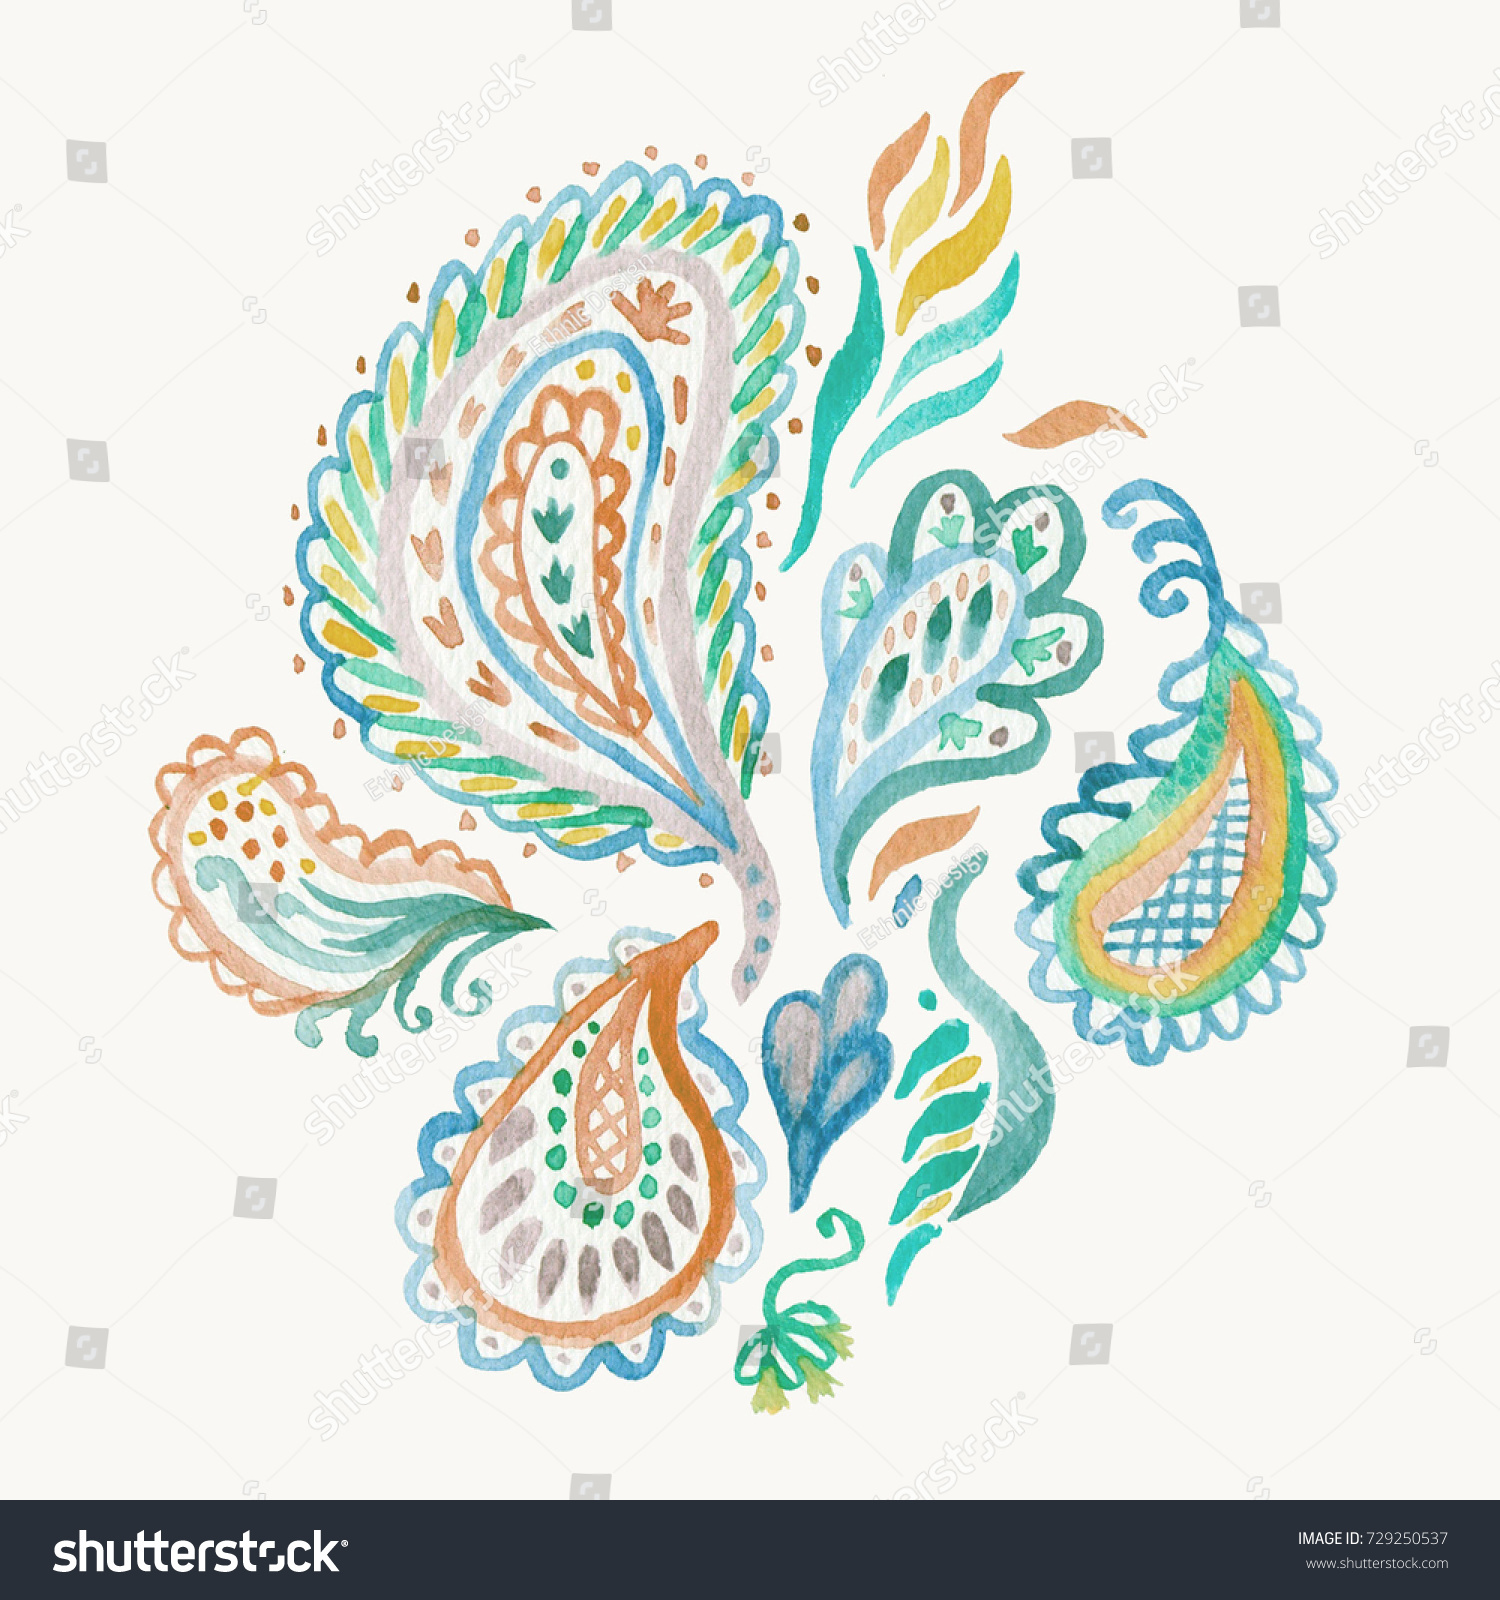 Paisley Watercolor Ethnic Card Pattern. Indian Artistic Handmade Batik  Print. Swimwear Fabric. Hand